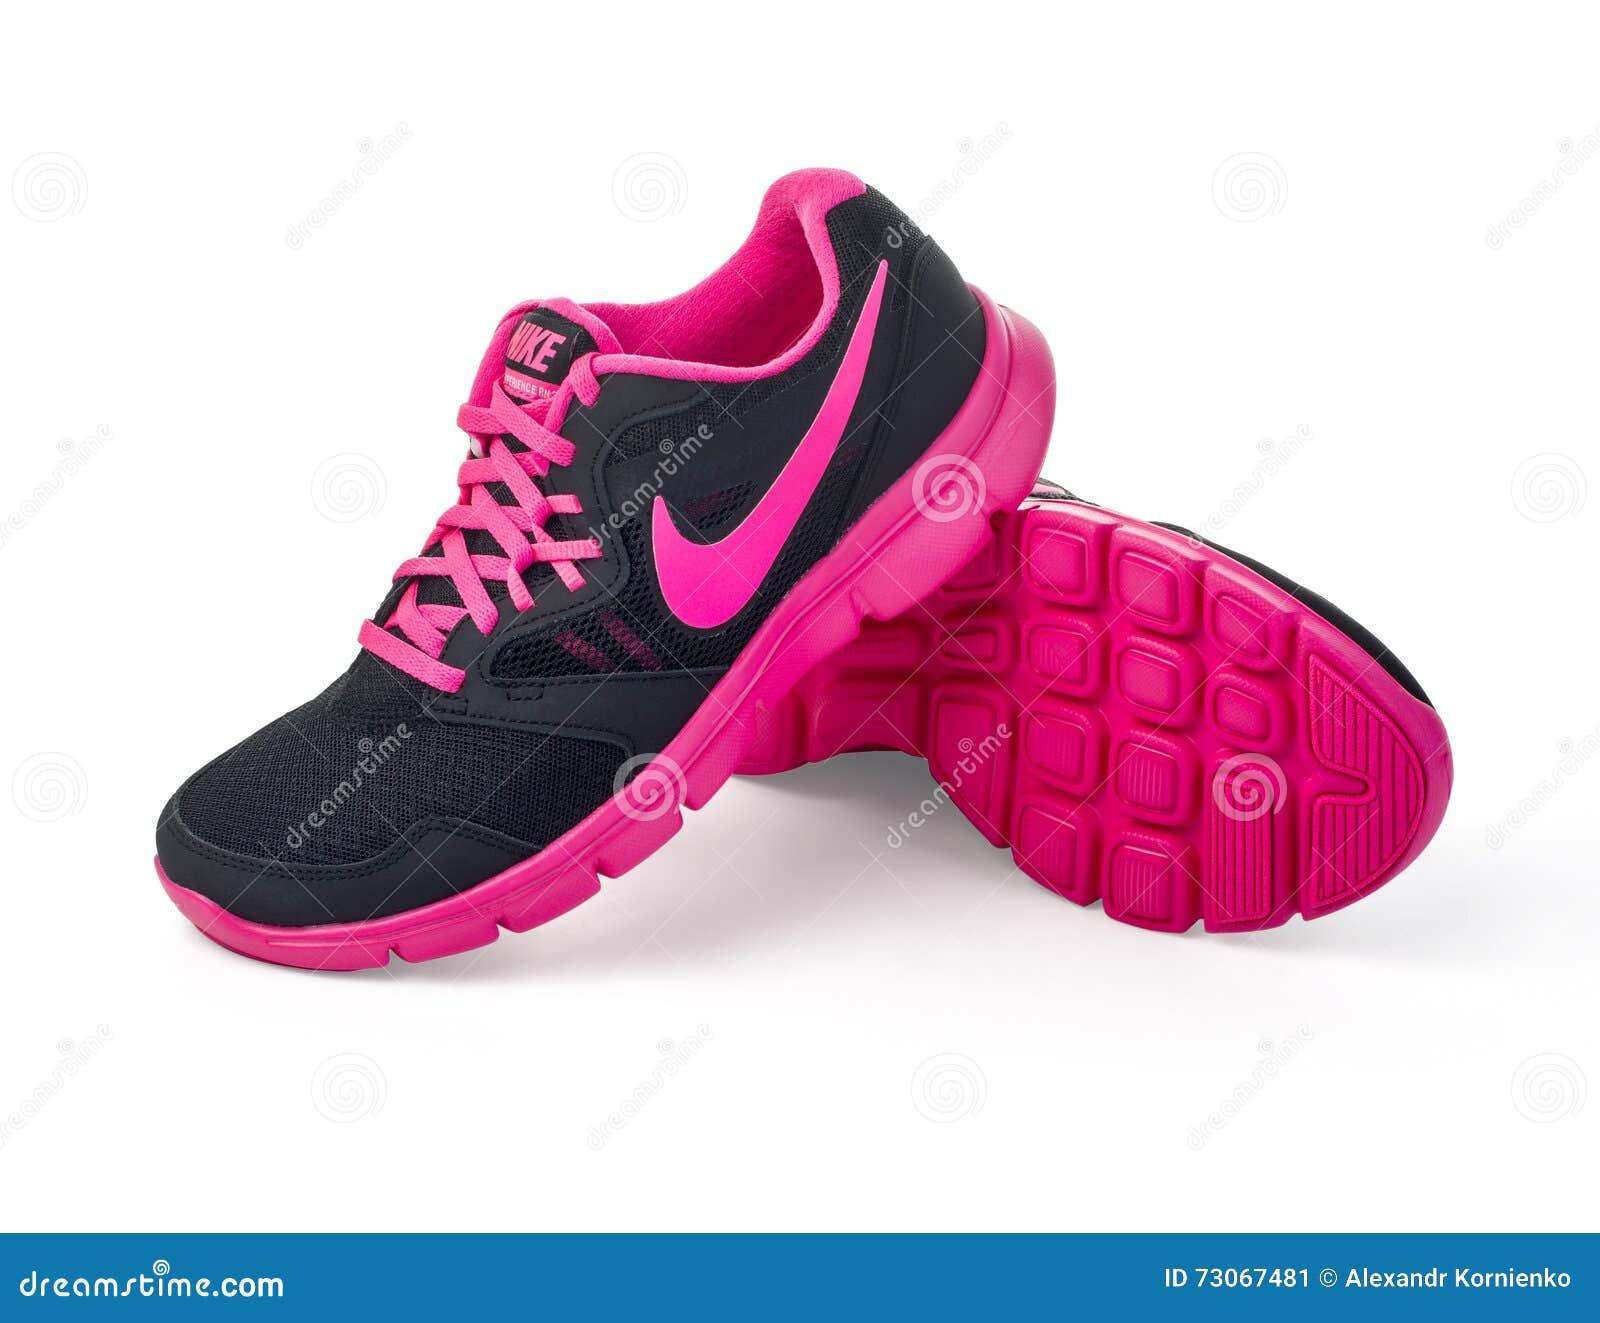 d530c7d755c Chisinau, Μολδαβία 27 Μαΐου 2015: Κυρίας της Nike - τρέχοντας παπούτσια των  γυναικών - πάνινα παπούτσια - εκπαιδευτές, γκρίζος και ρόδινος, ...